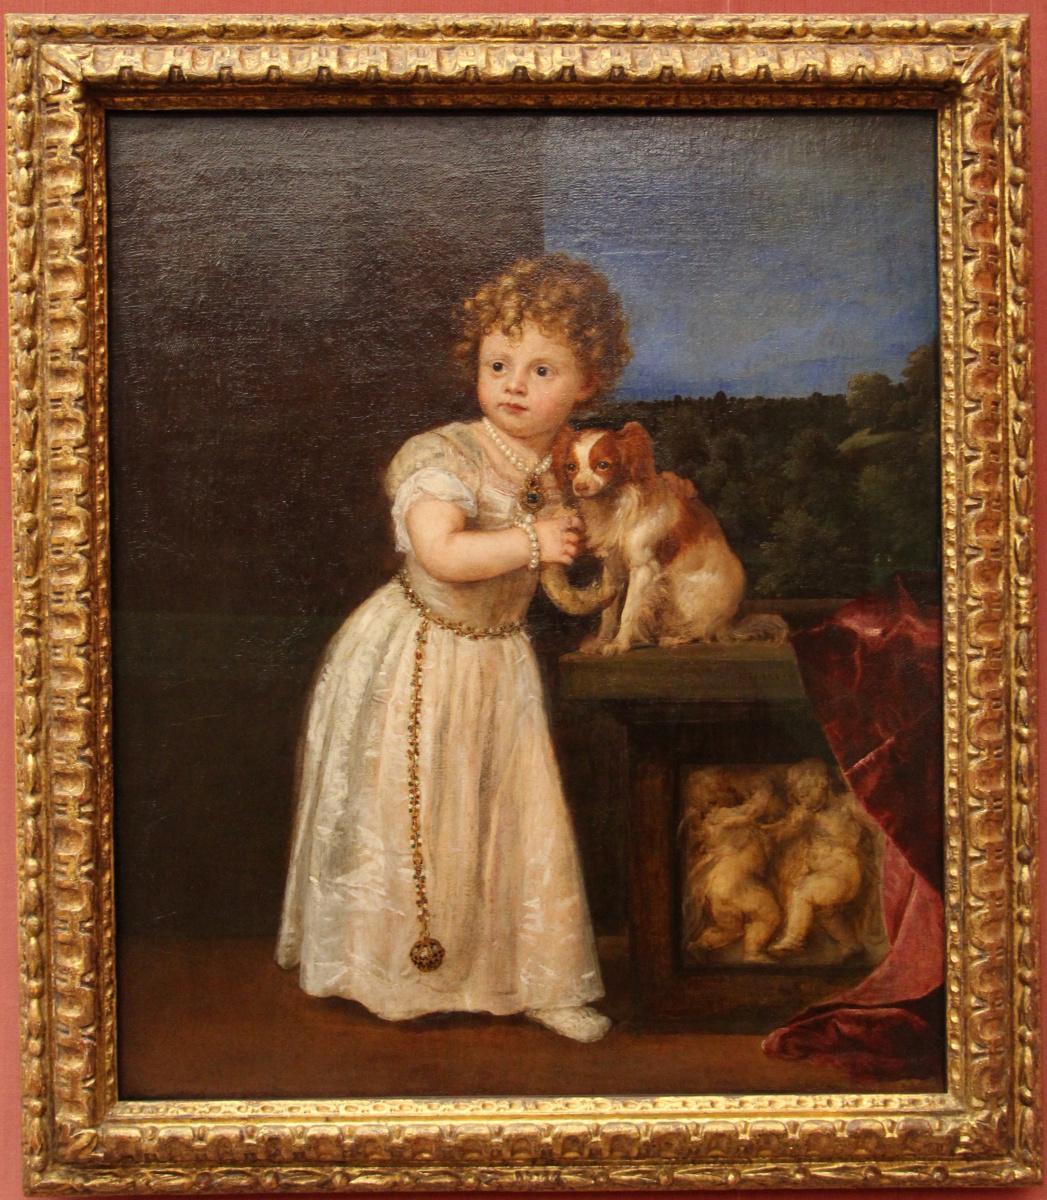 Portrait of Clarissa Strozzi, daughter of Roberto Strozzi. Fragment